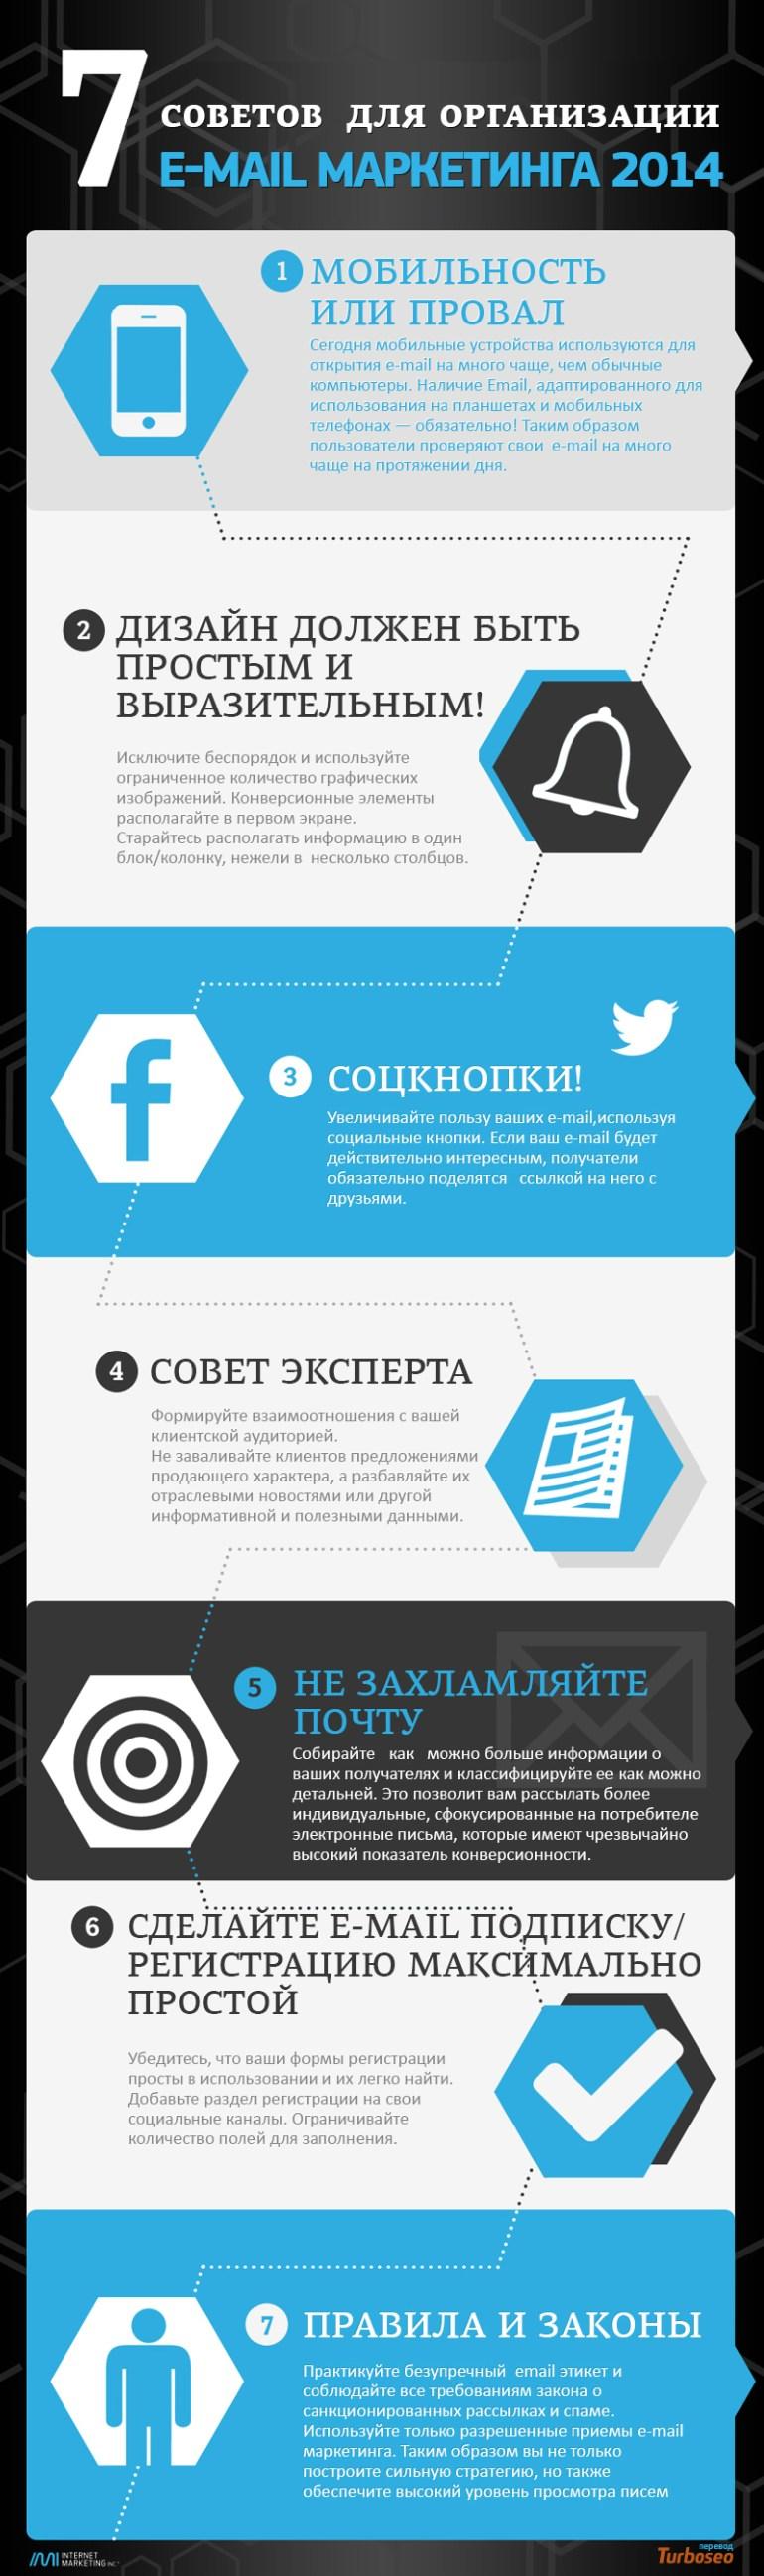 7emailmarketingtips_rus.jpg7emailmarketingtips_rus